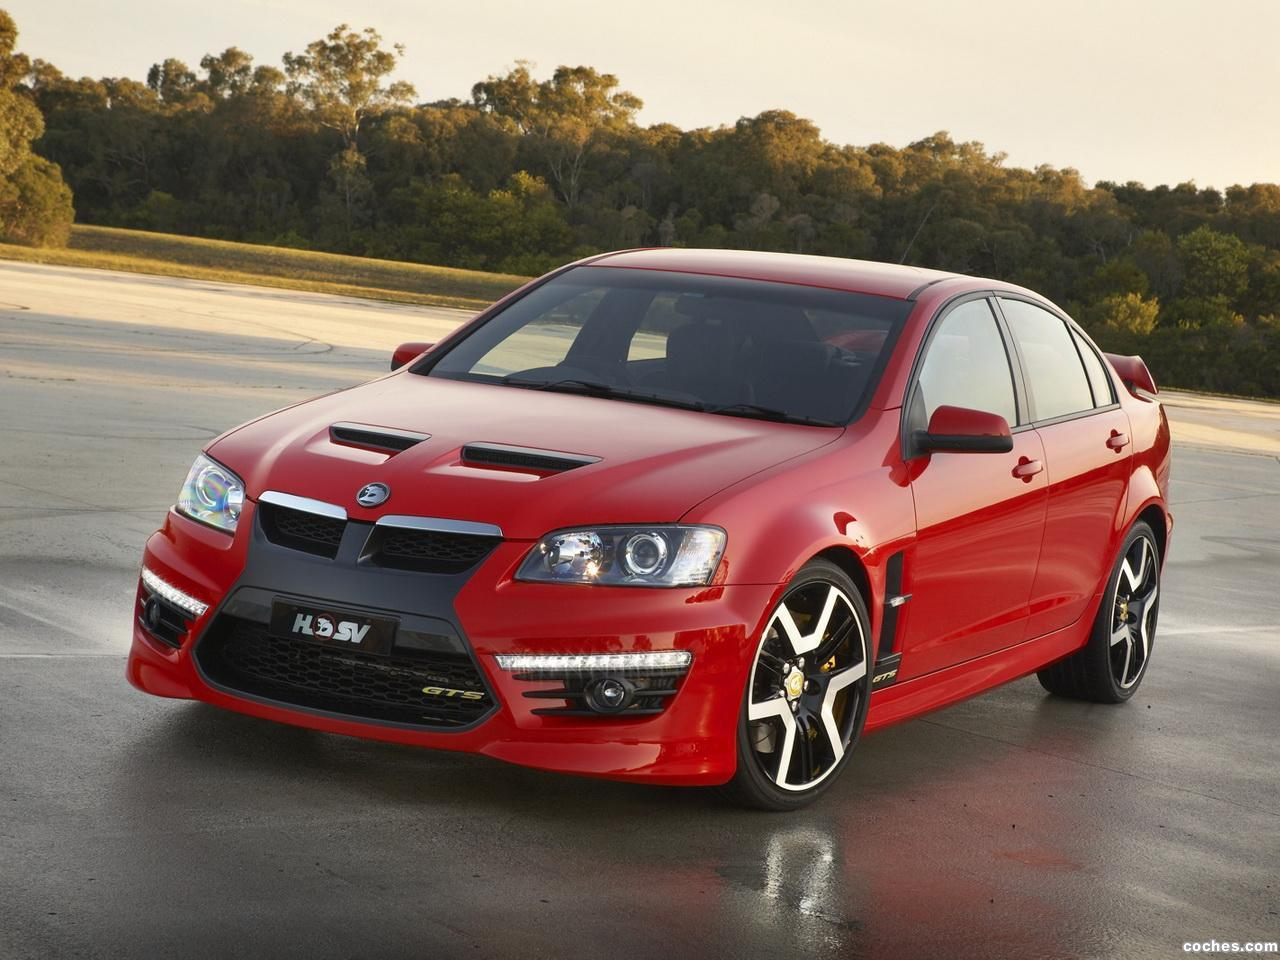 Foto 3 de Holden HSV GTS 2010